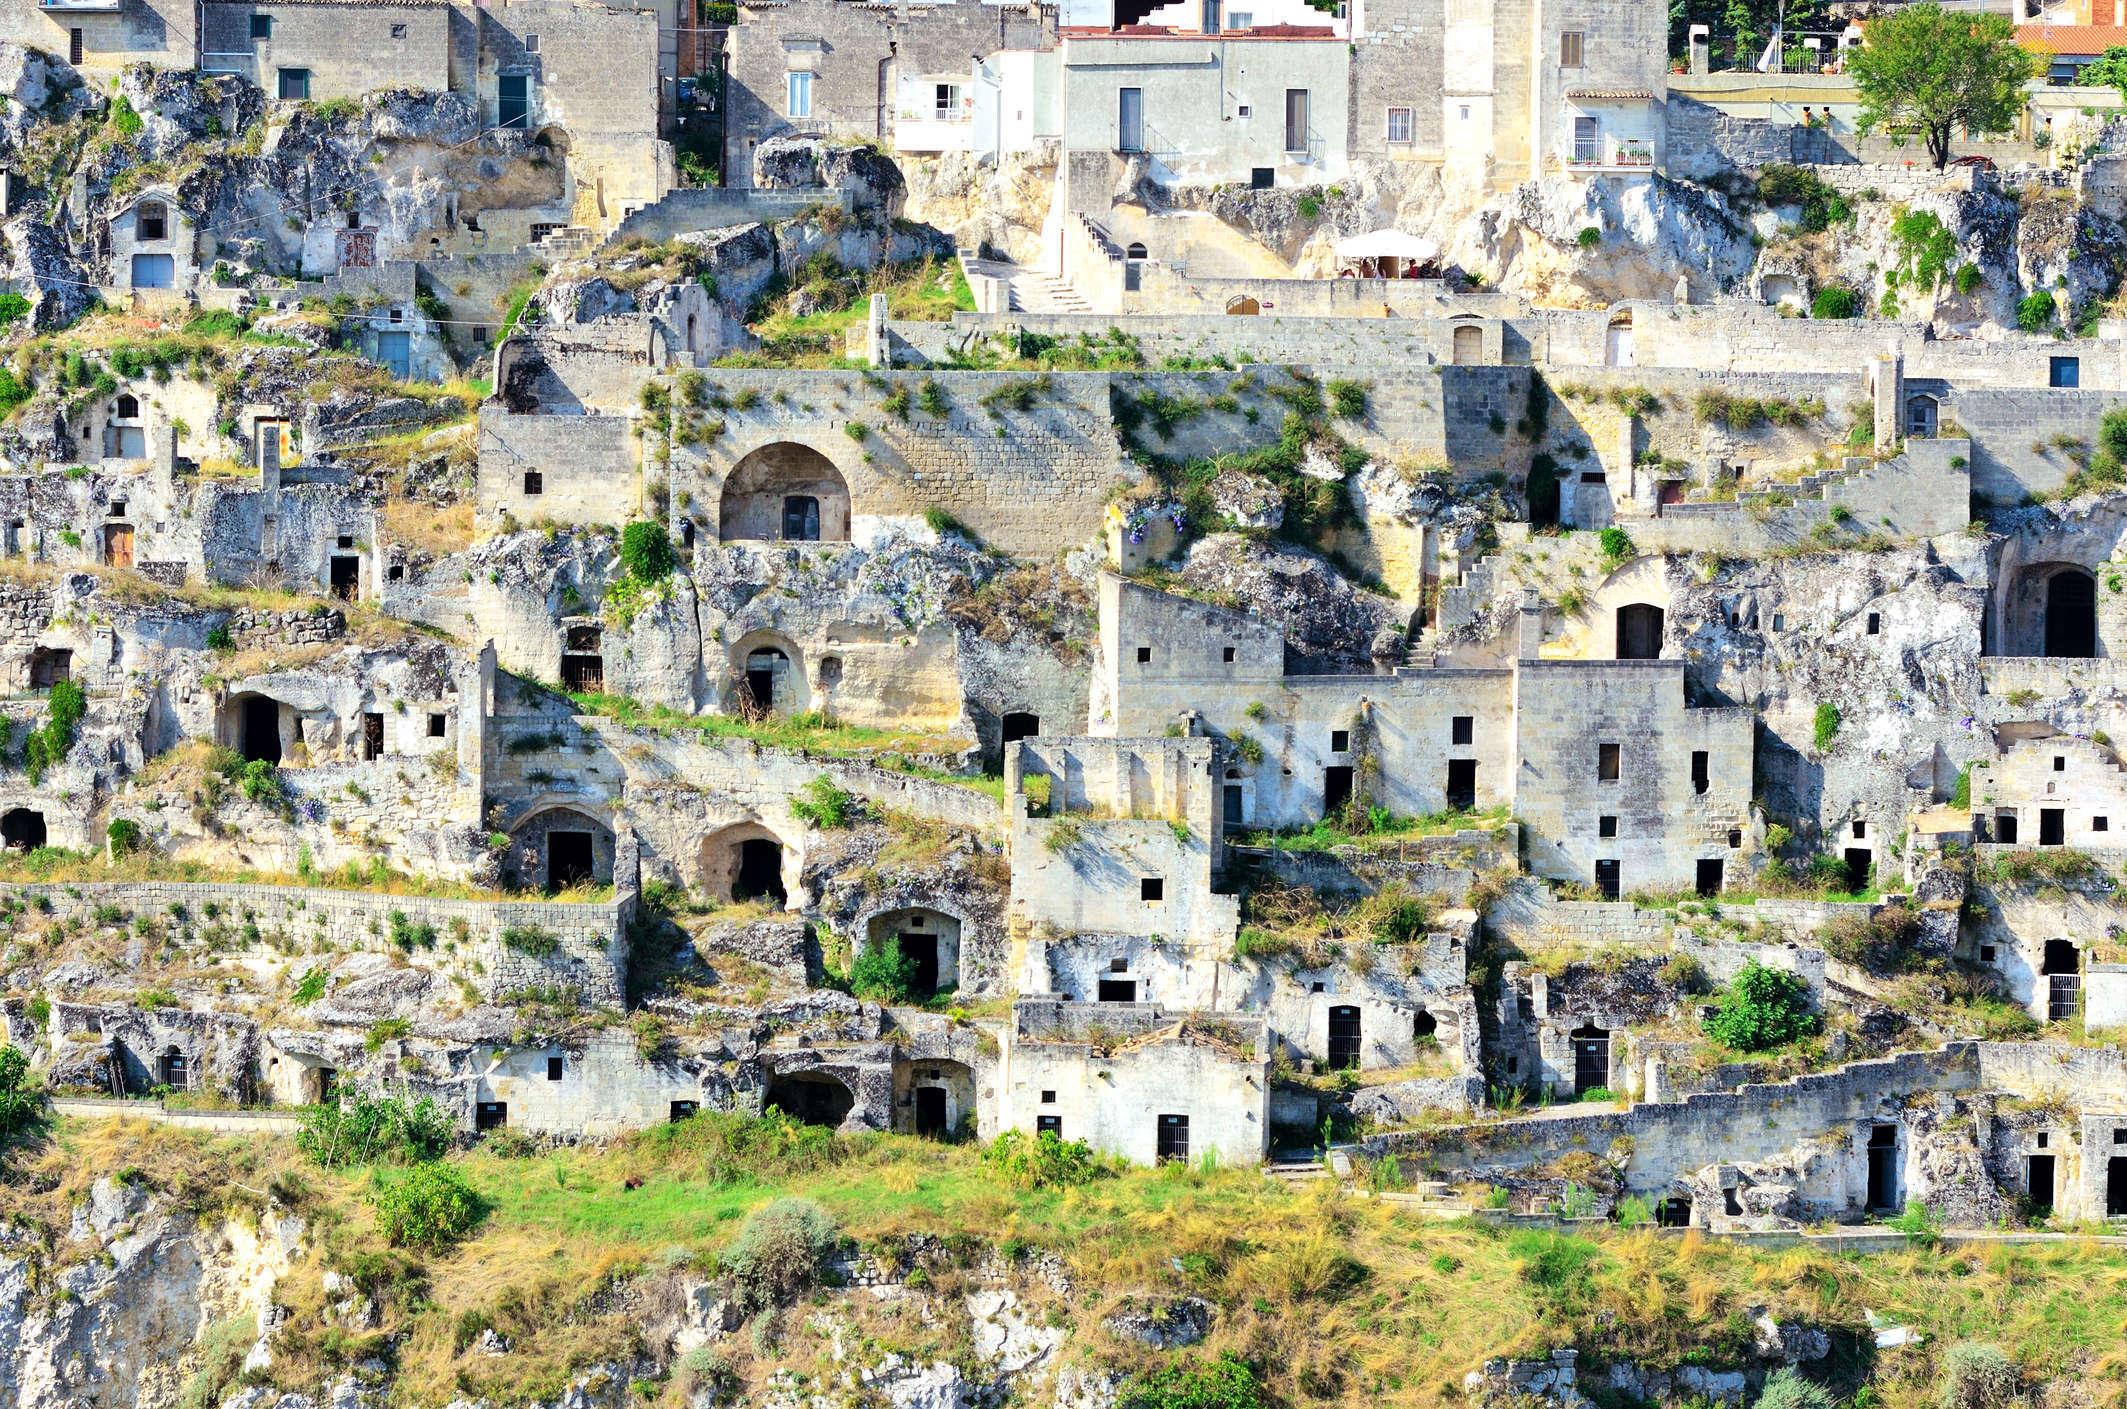 5° giorno: Metaponto - Matera - Salerno